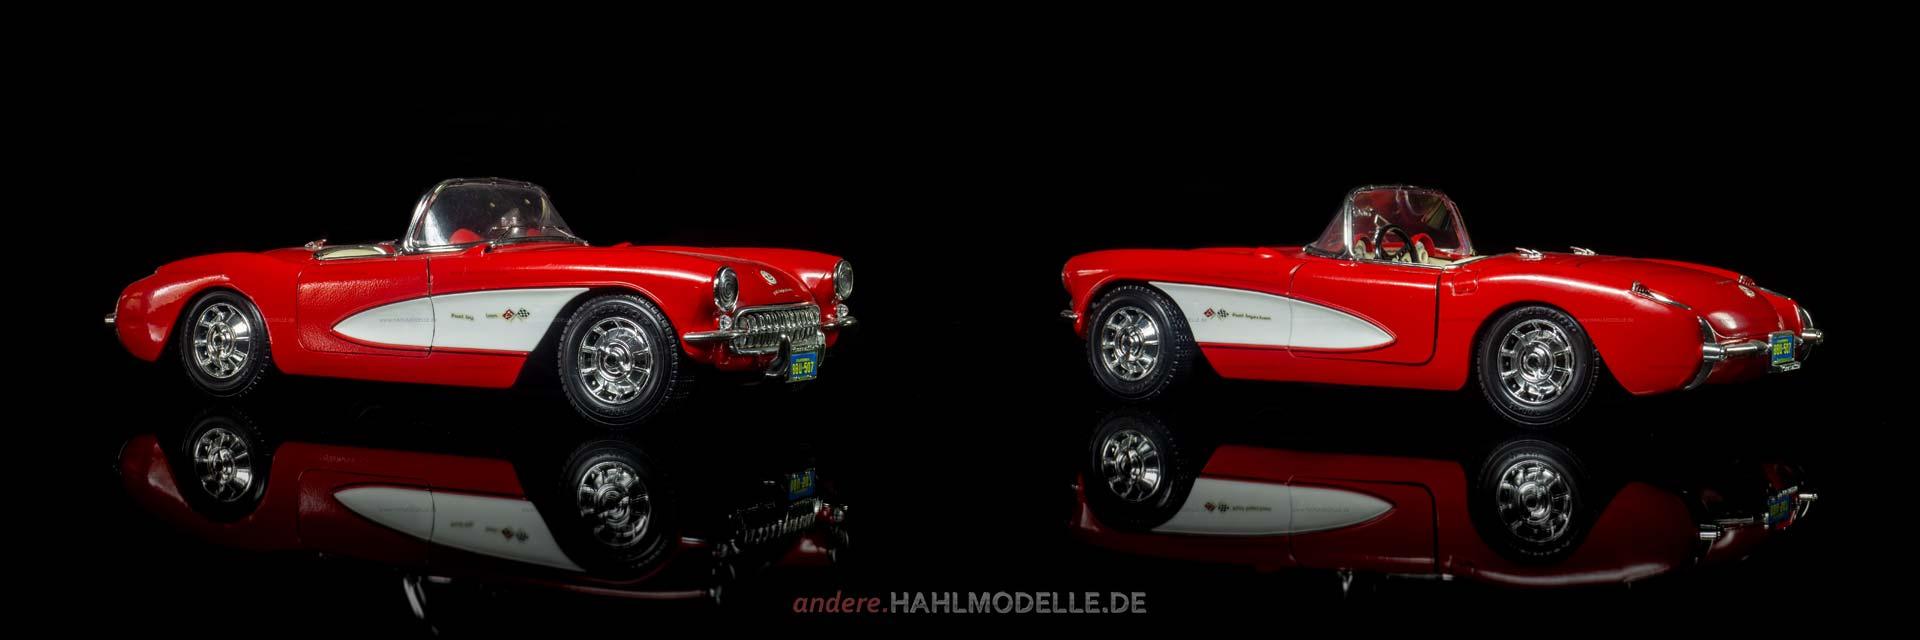 Chevrolet Corvette C1 | Roadster | Bburago | 1:18 | www.andere.hahlmodelle.de